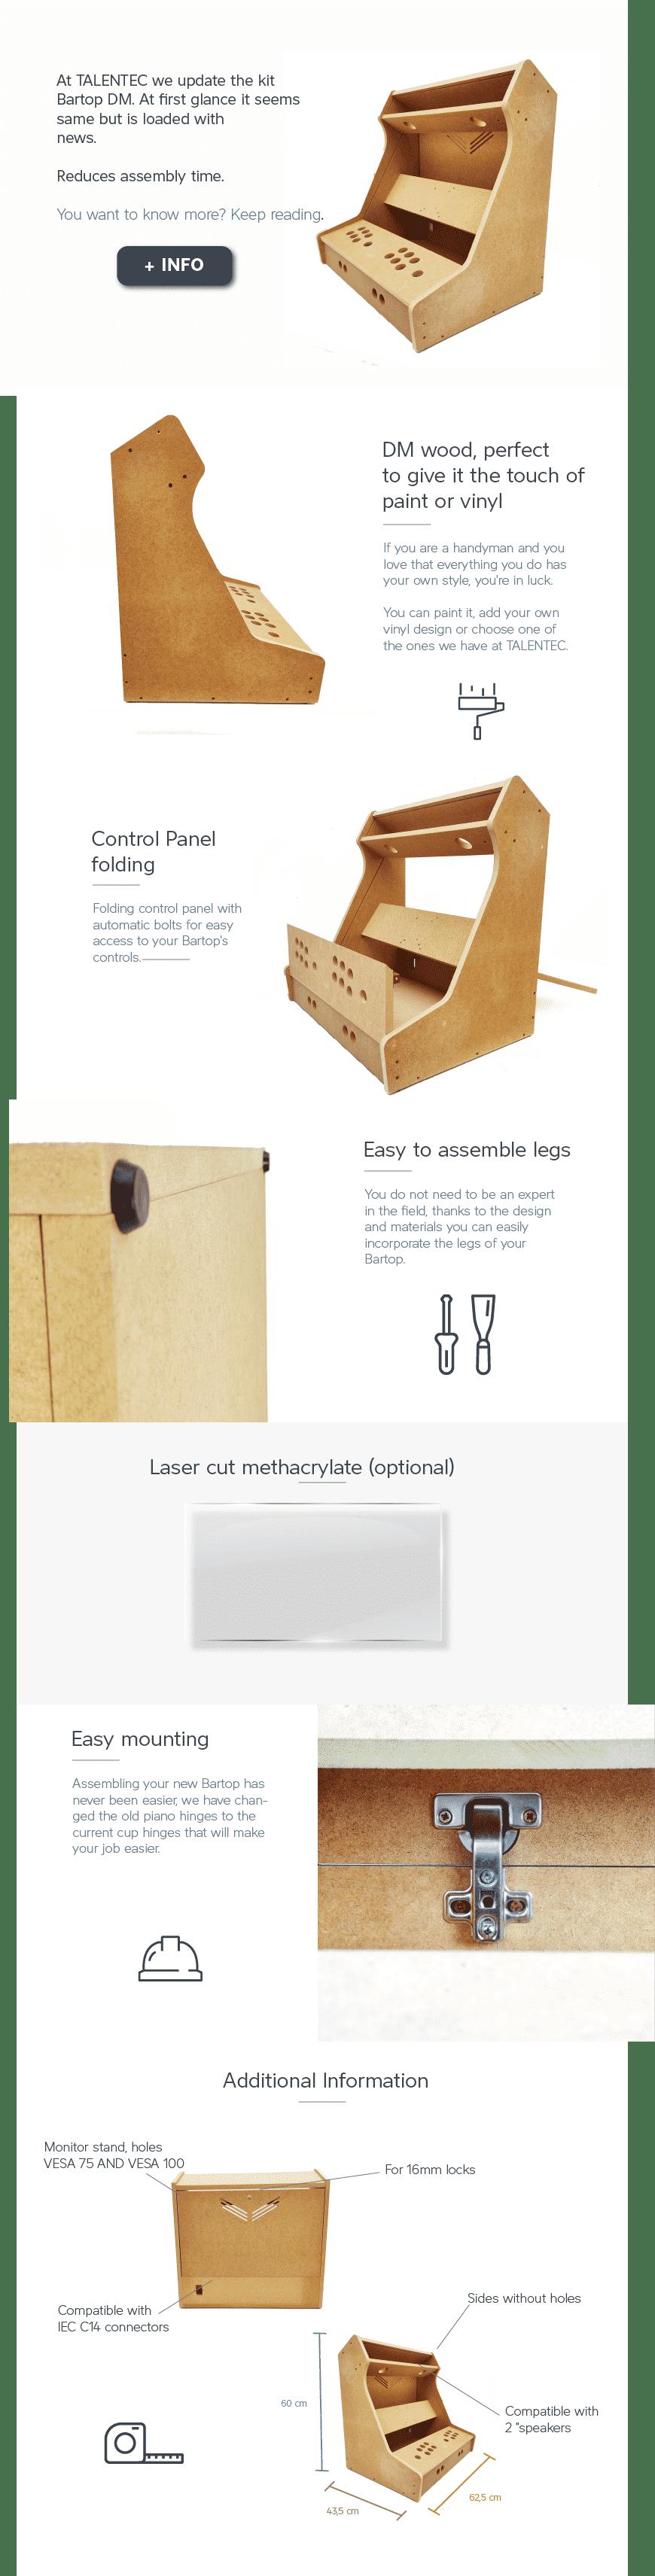 "ingles - Configure your 24"" kit bartop - kits-bartop-en"